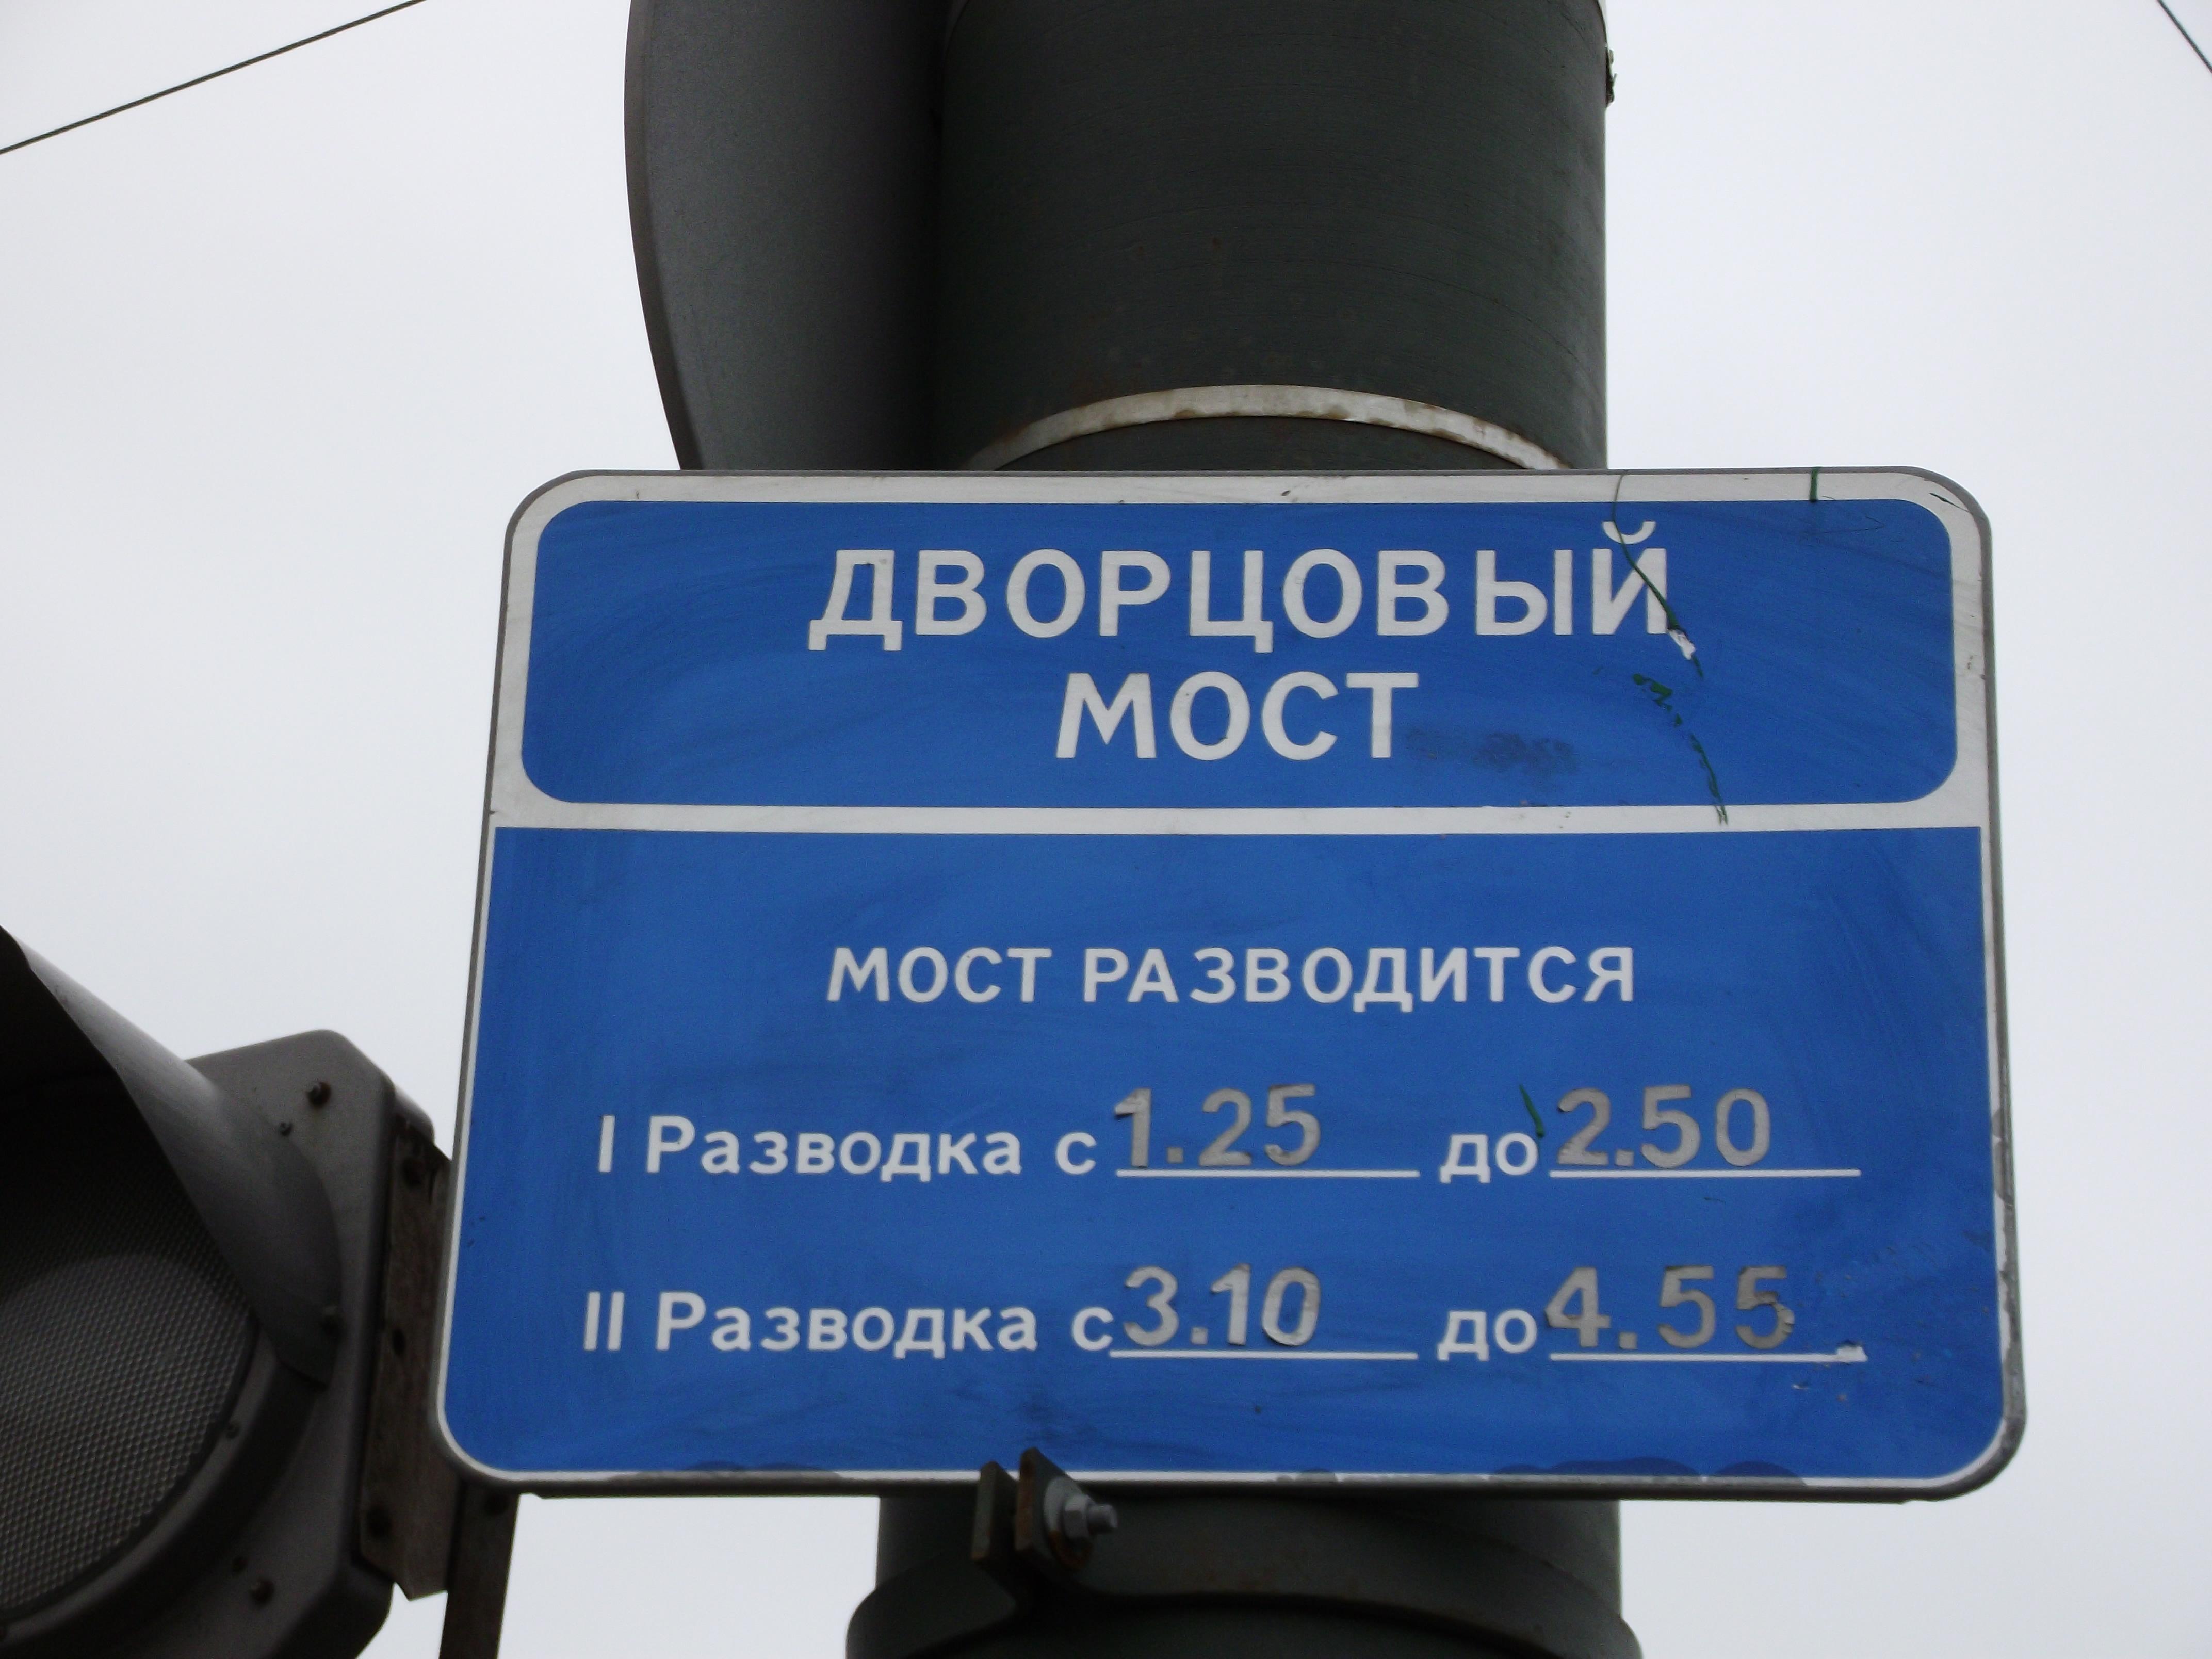 https://img-fotki.yandex.ru/get/96770/308040732.5d/0_14c92b_4ac07105_orig